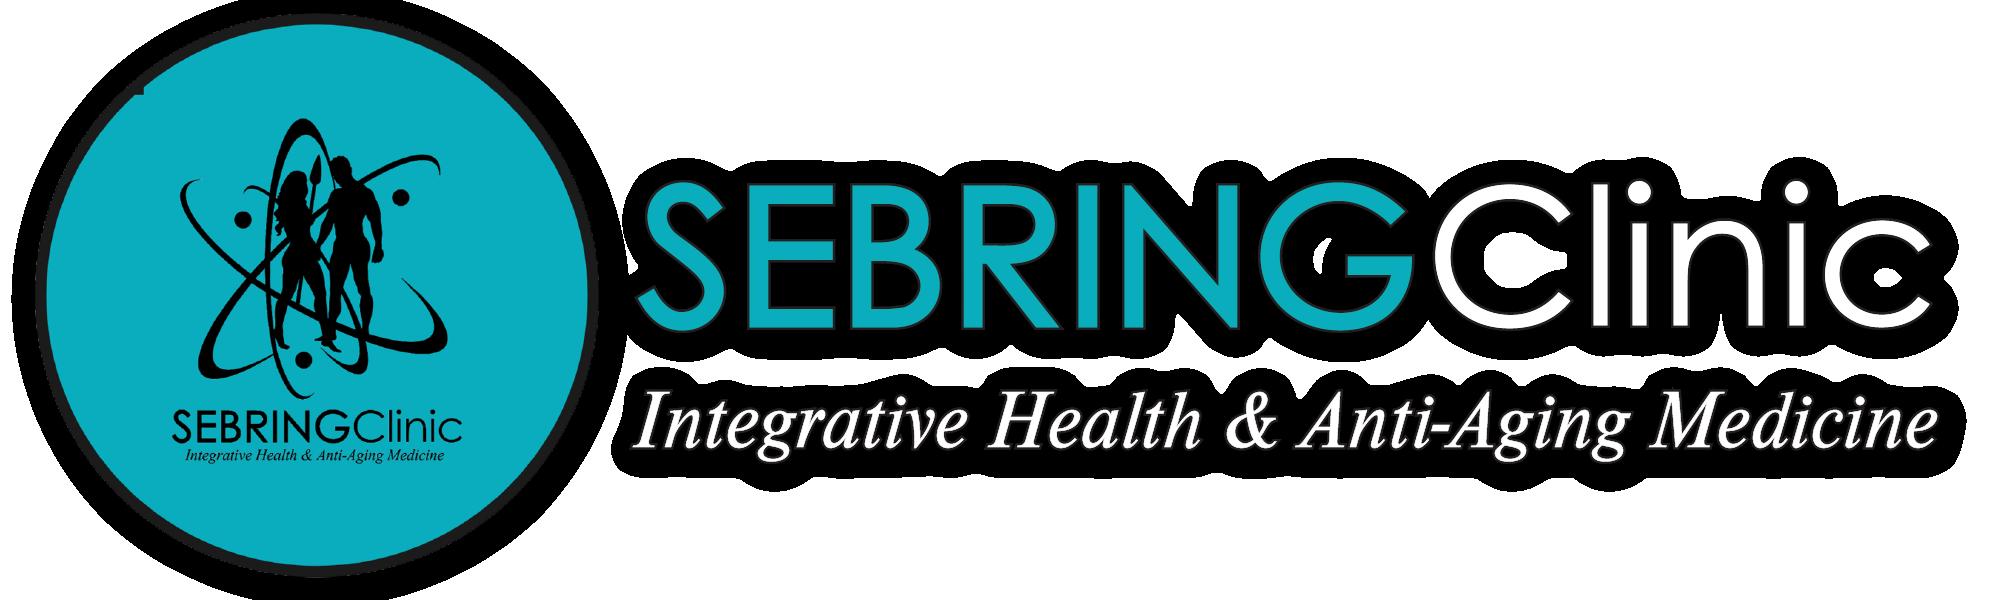 The Sebring Clinic